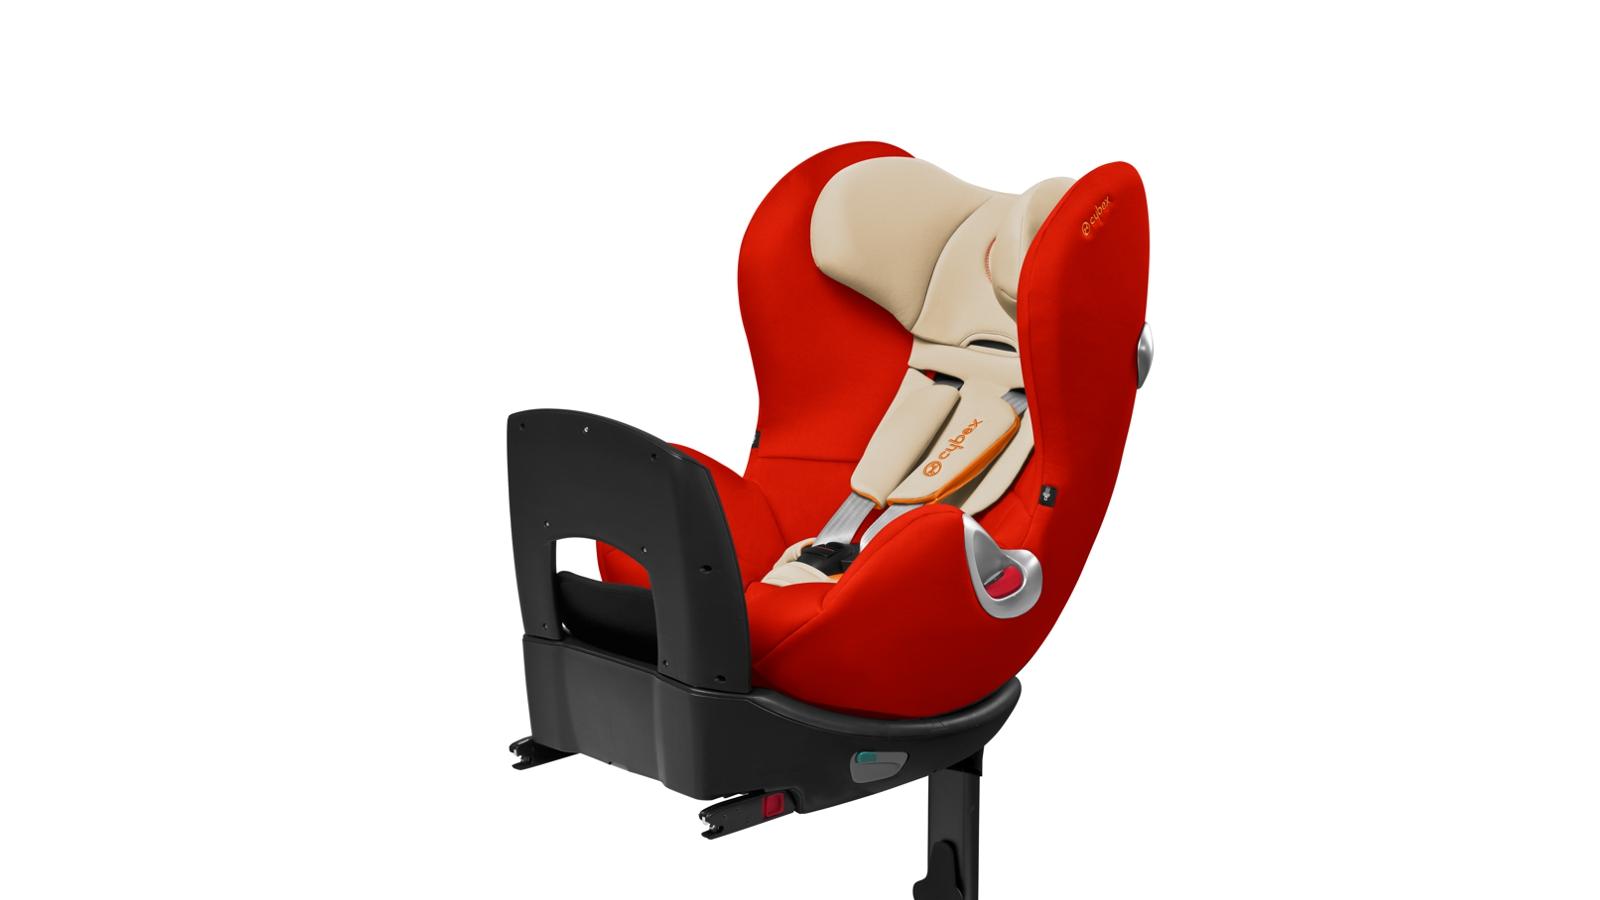 cybex sirona koncern. Black Bedroom Furniture Sets. Home Design Ideas